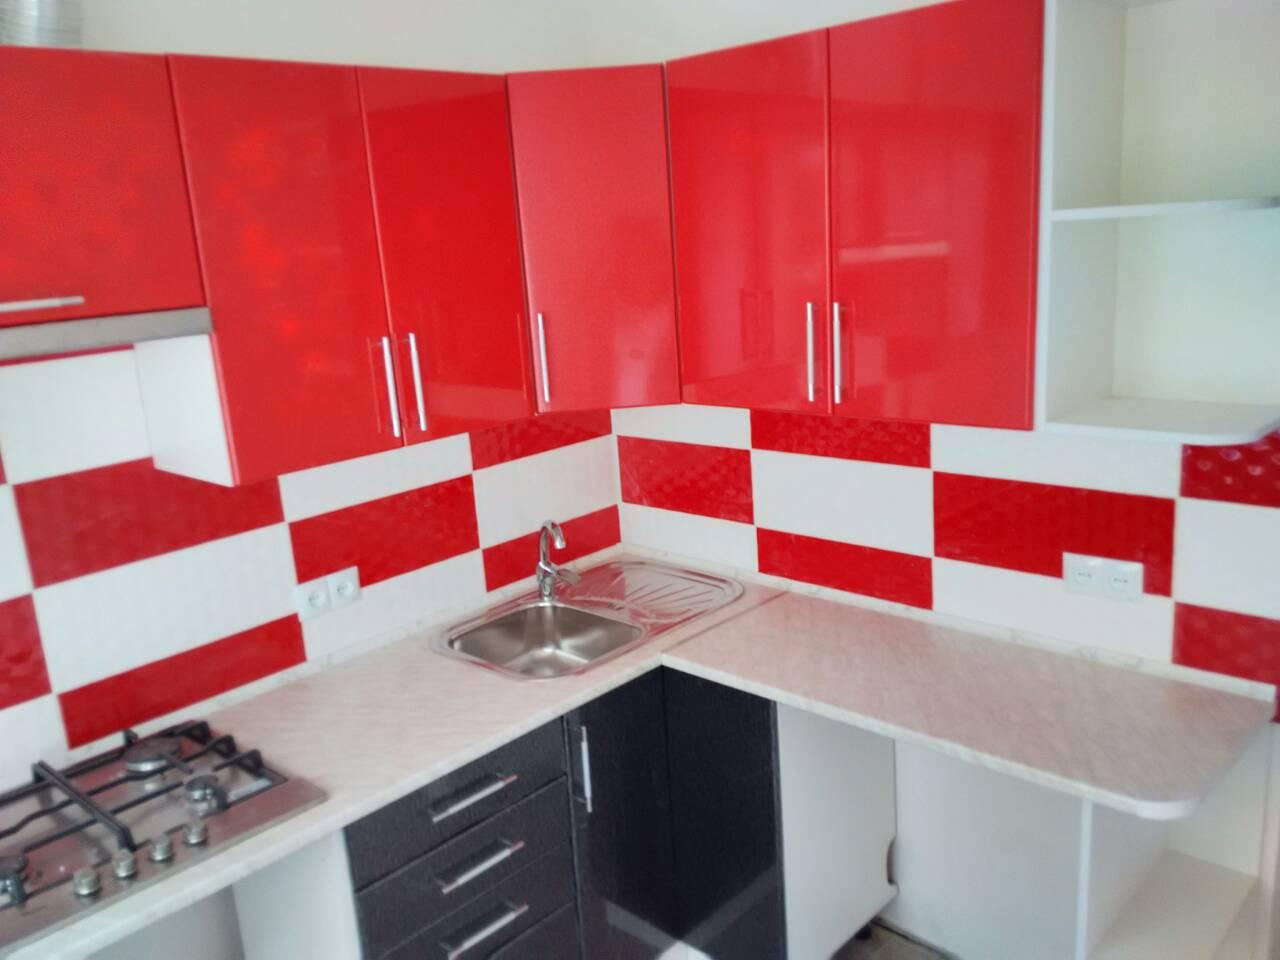 Продается 2-комнатная квартира на ул. Кармена Романа (1-Й Пролетарский Пер) — 59 000 у.е. (фото №4)